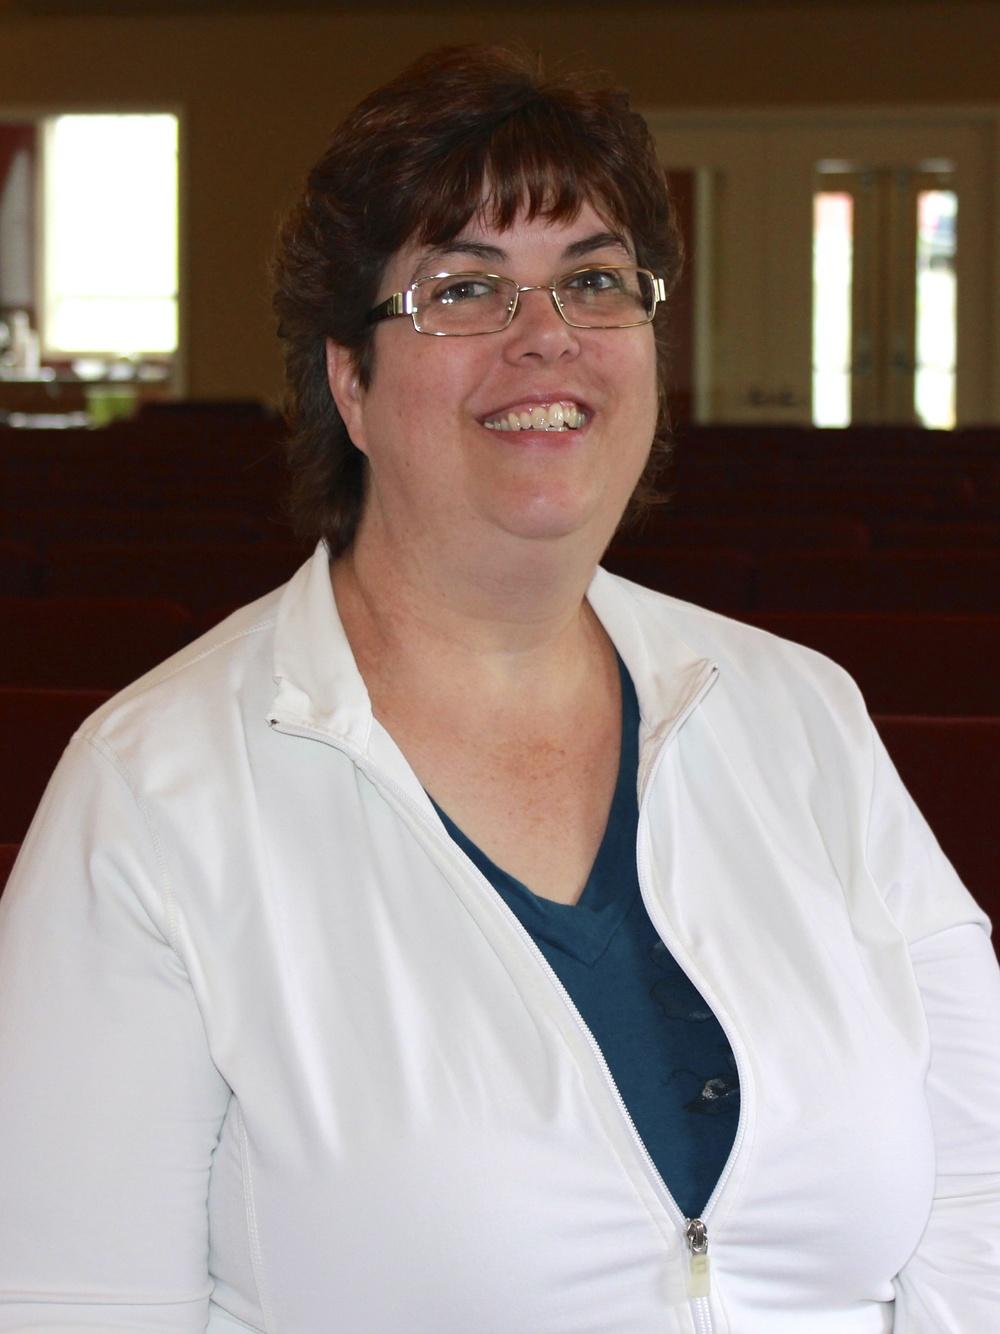 Lori Shero -Administrative Assistant